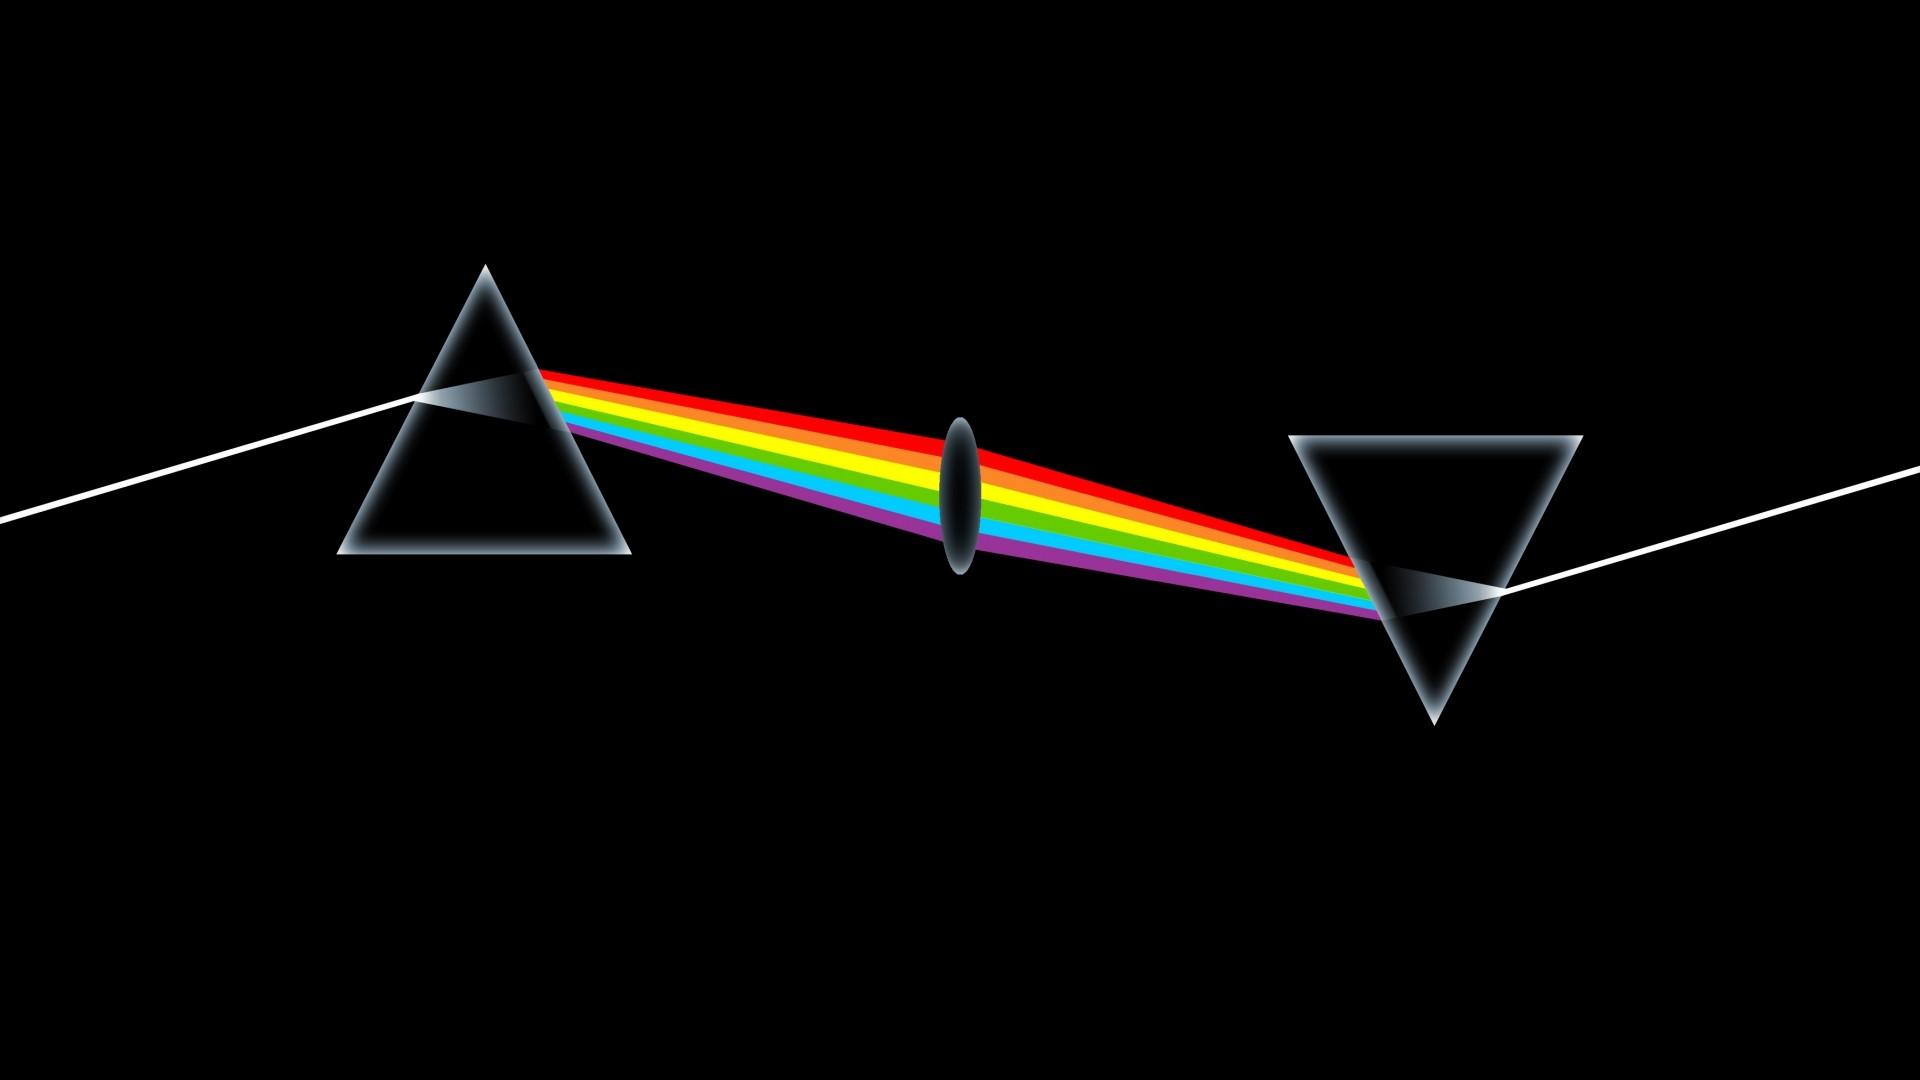 Pink Floyd hard rock classic retro bands groups album covers logo wallpaper  | | 26111 | WallpaperUP